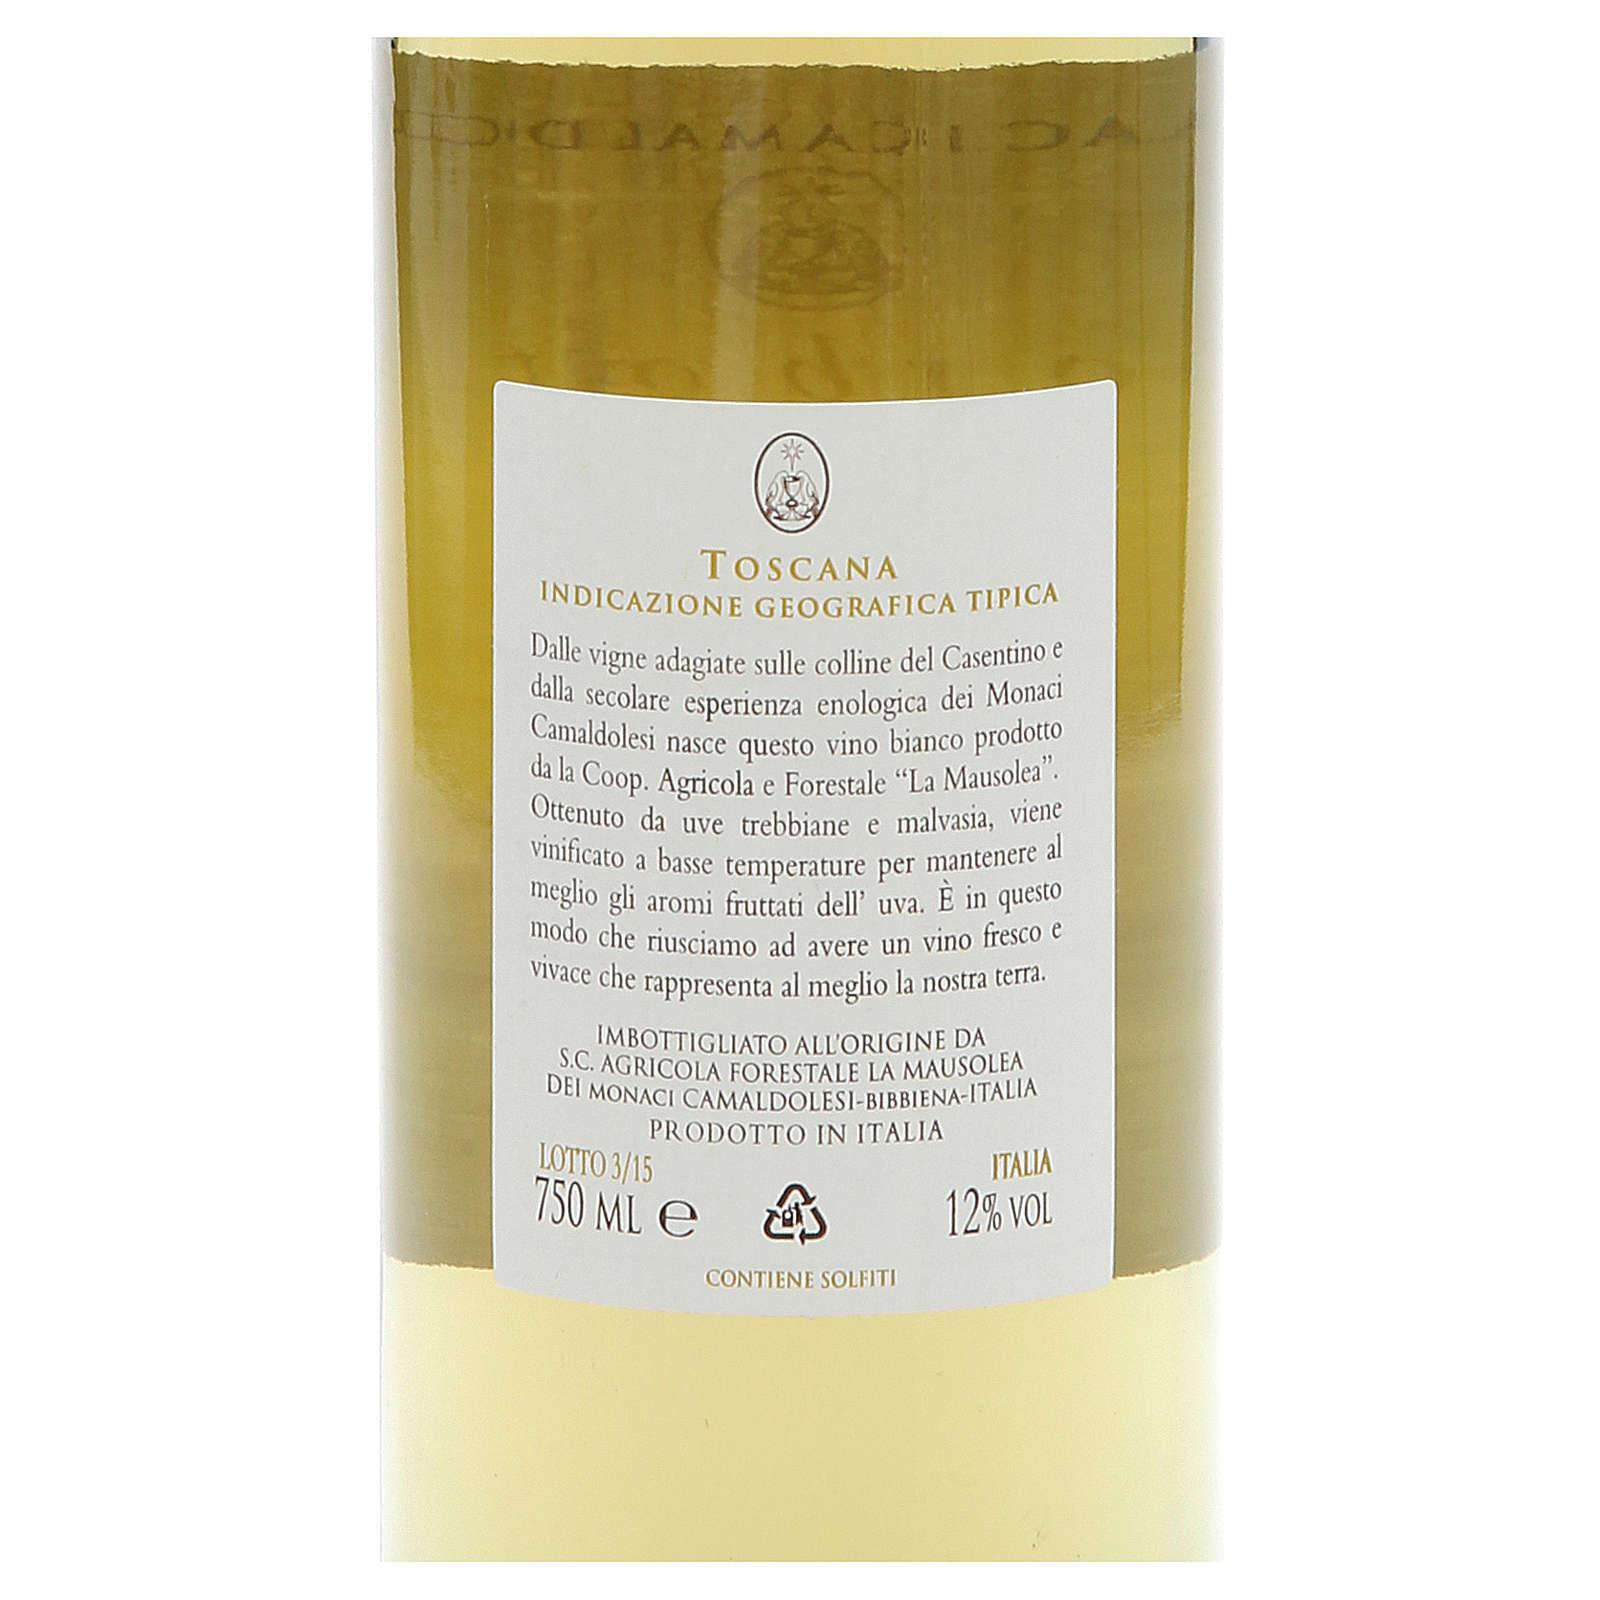 Vino blanco Toscano Borbotto 750 ml, 2014 3